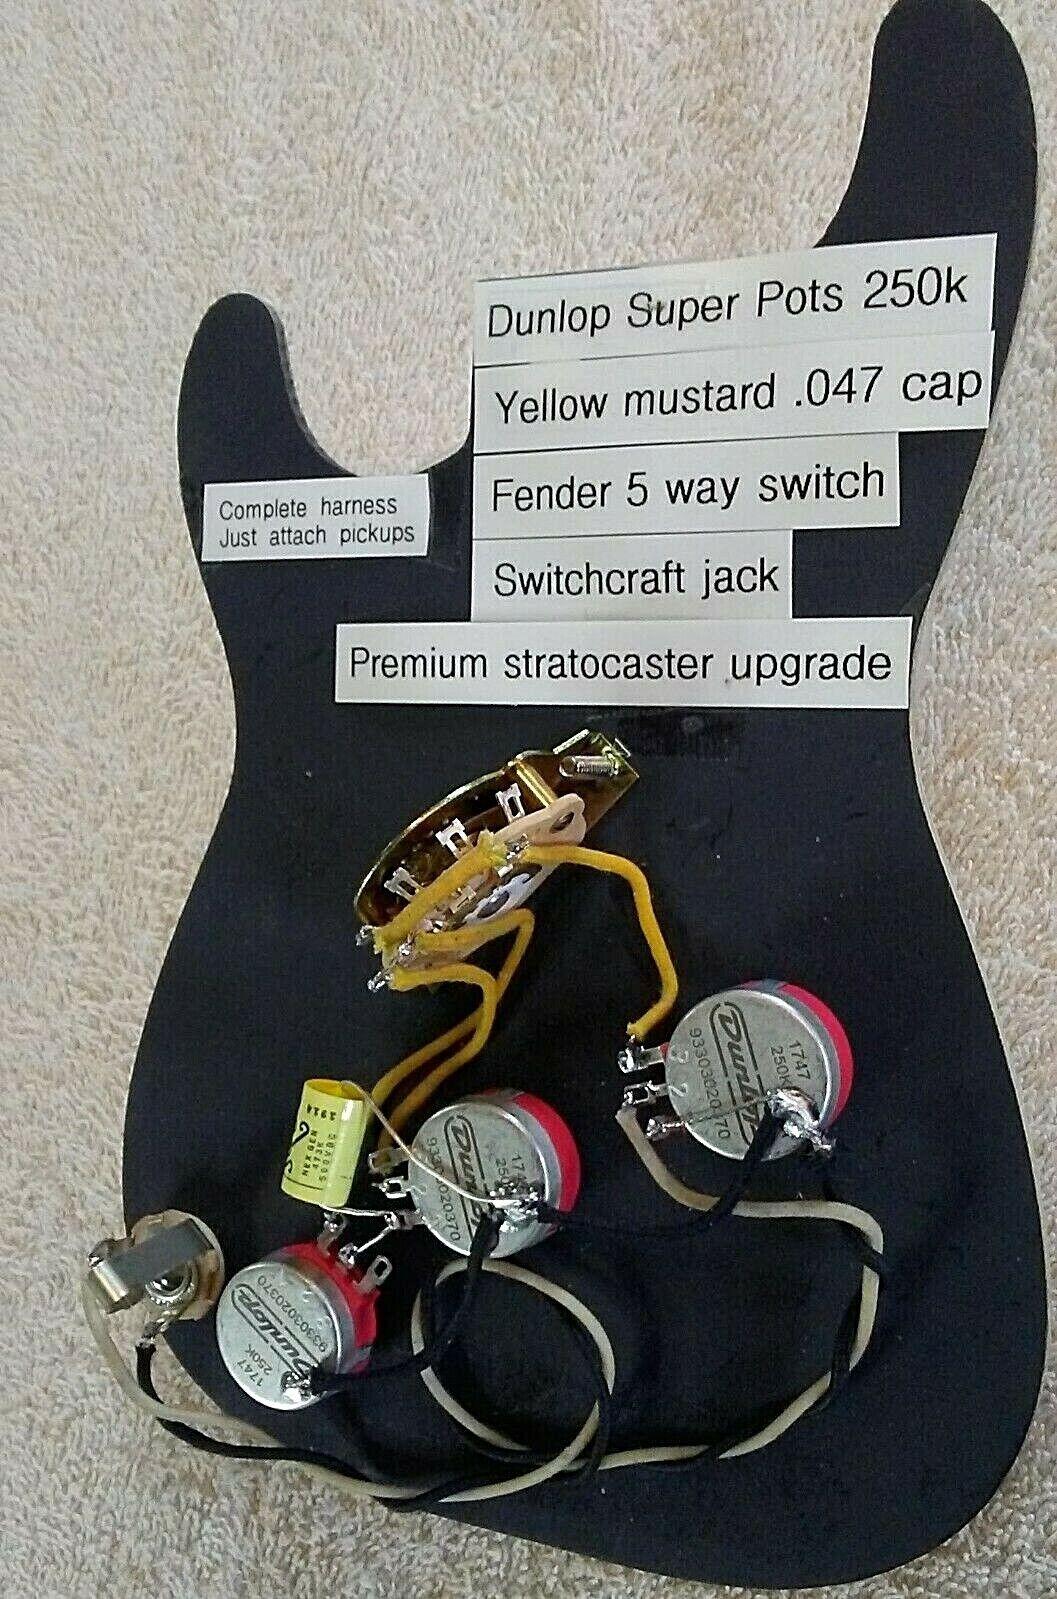 Stratocaster Solderless wiring upgrade Dunlop super pots Gelb mustard.045 cap